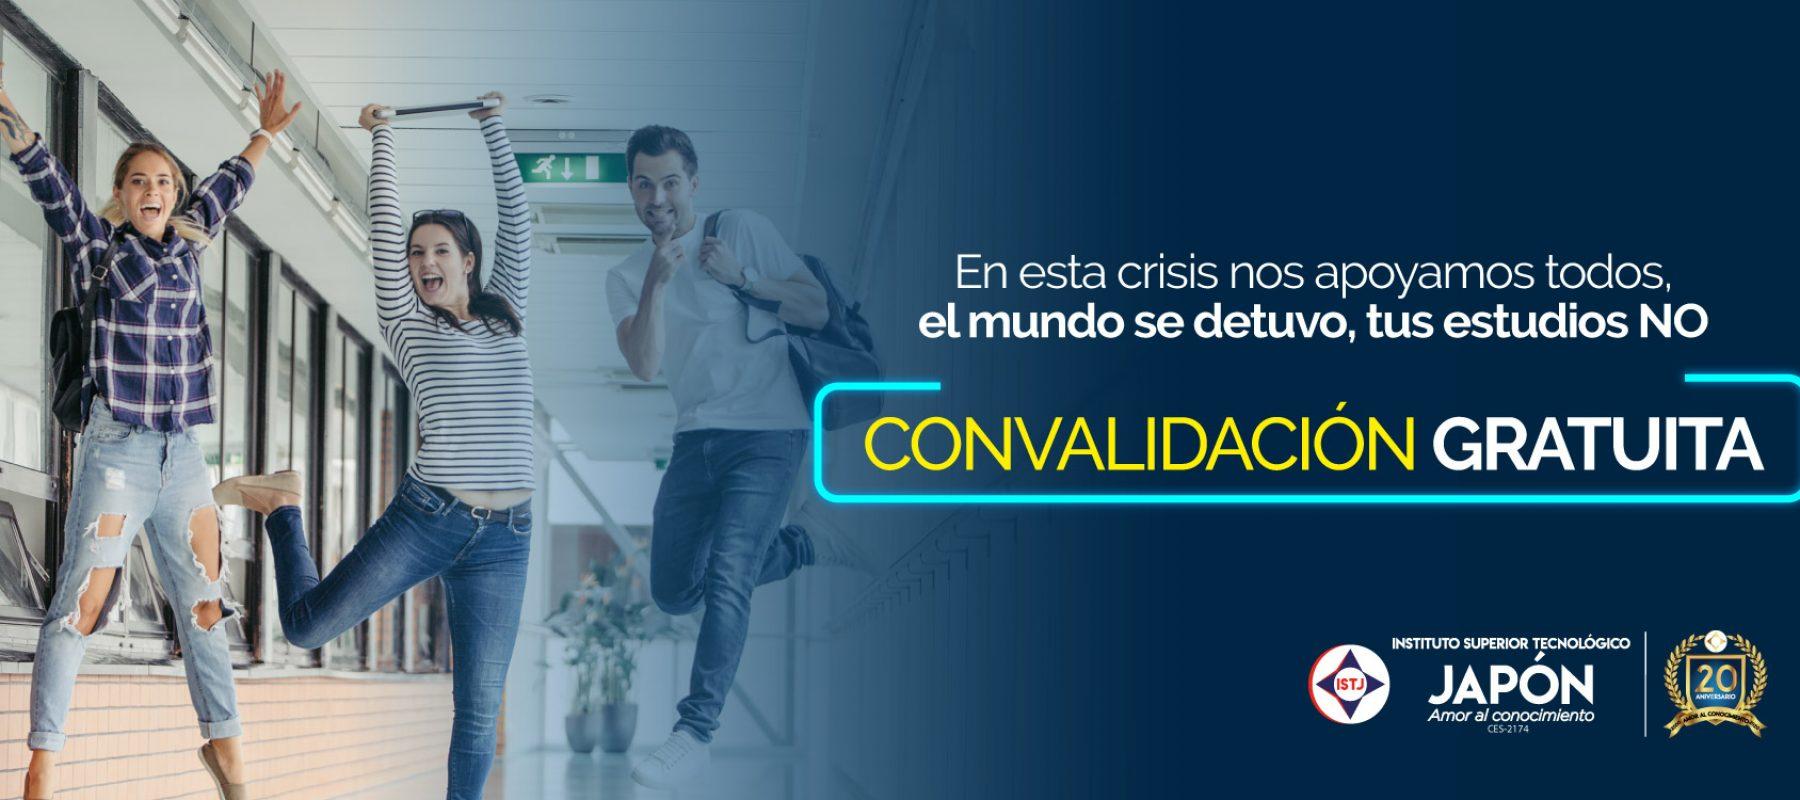 convalidacion-gratuita-web-1800x750